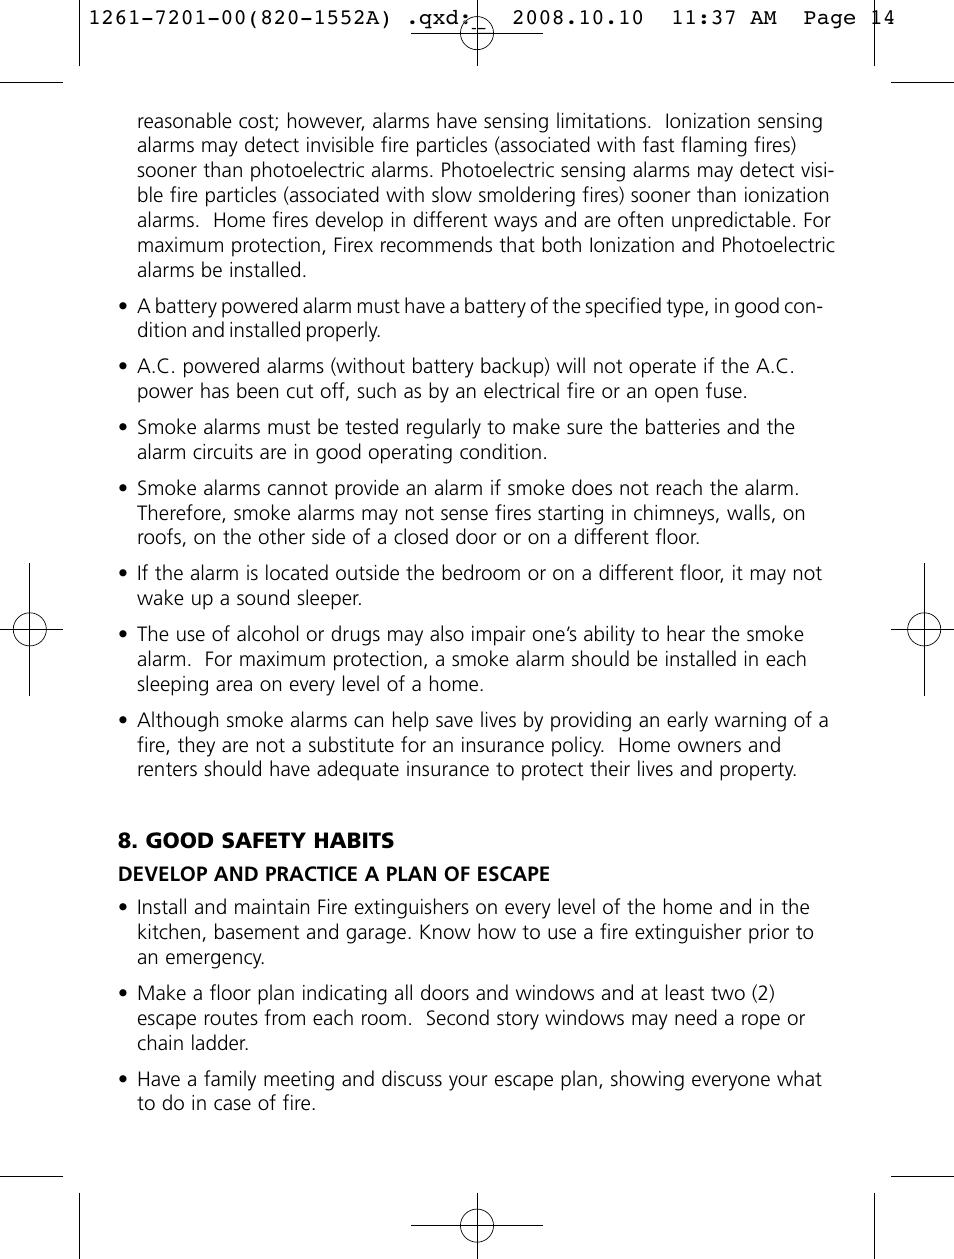 Firex Smoke Alarm i4618 User Manual | Page 14 / 18